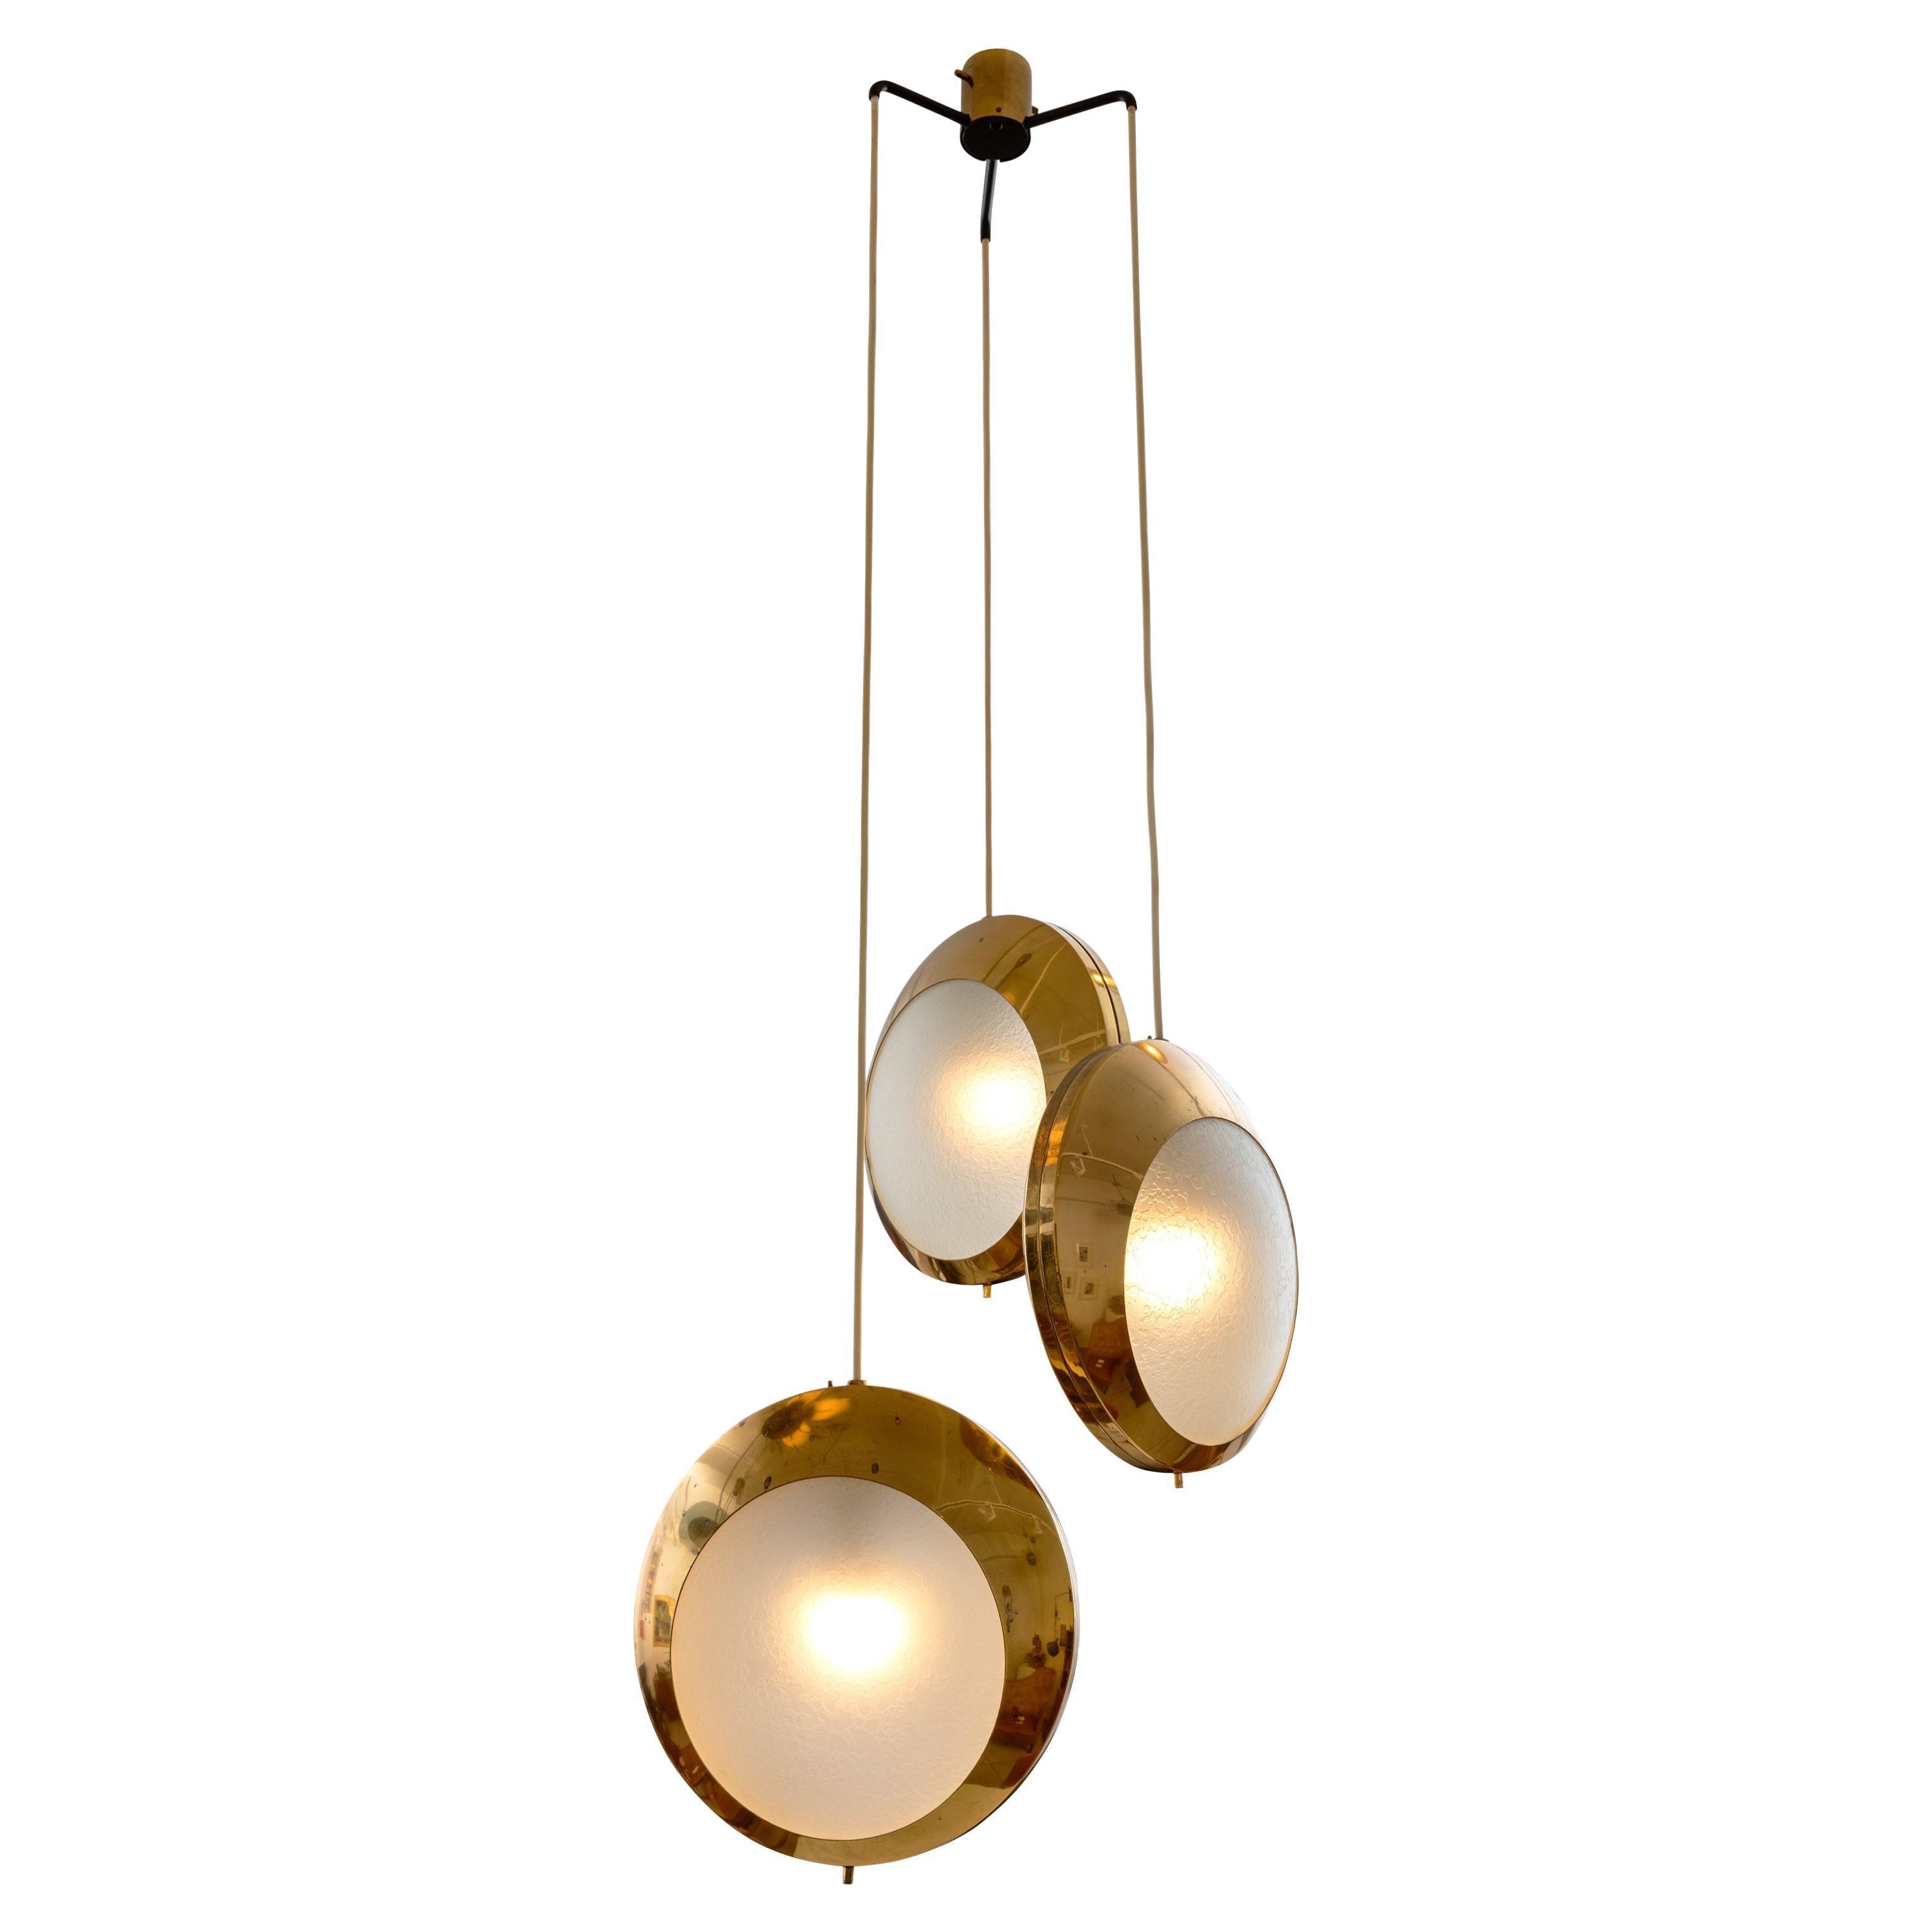 Stilnovo Brass & Textured Glass Three Pendant Light, Italy, 1950s